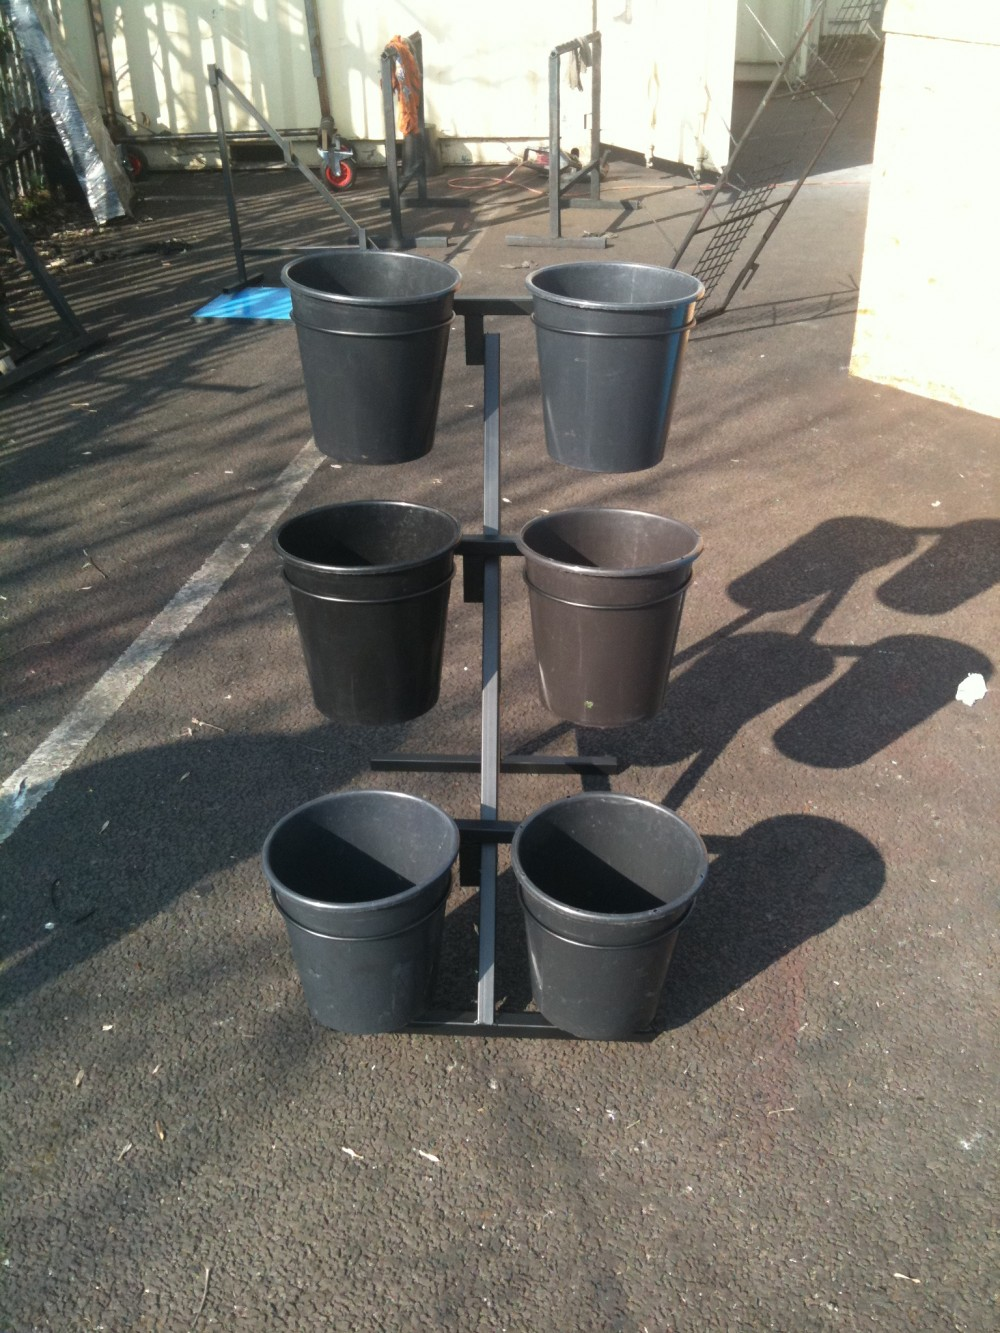 7 Bucket Flower Display Stand Uk Display Stands